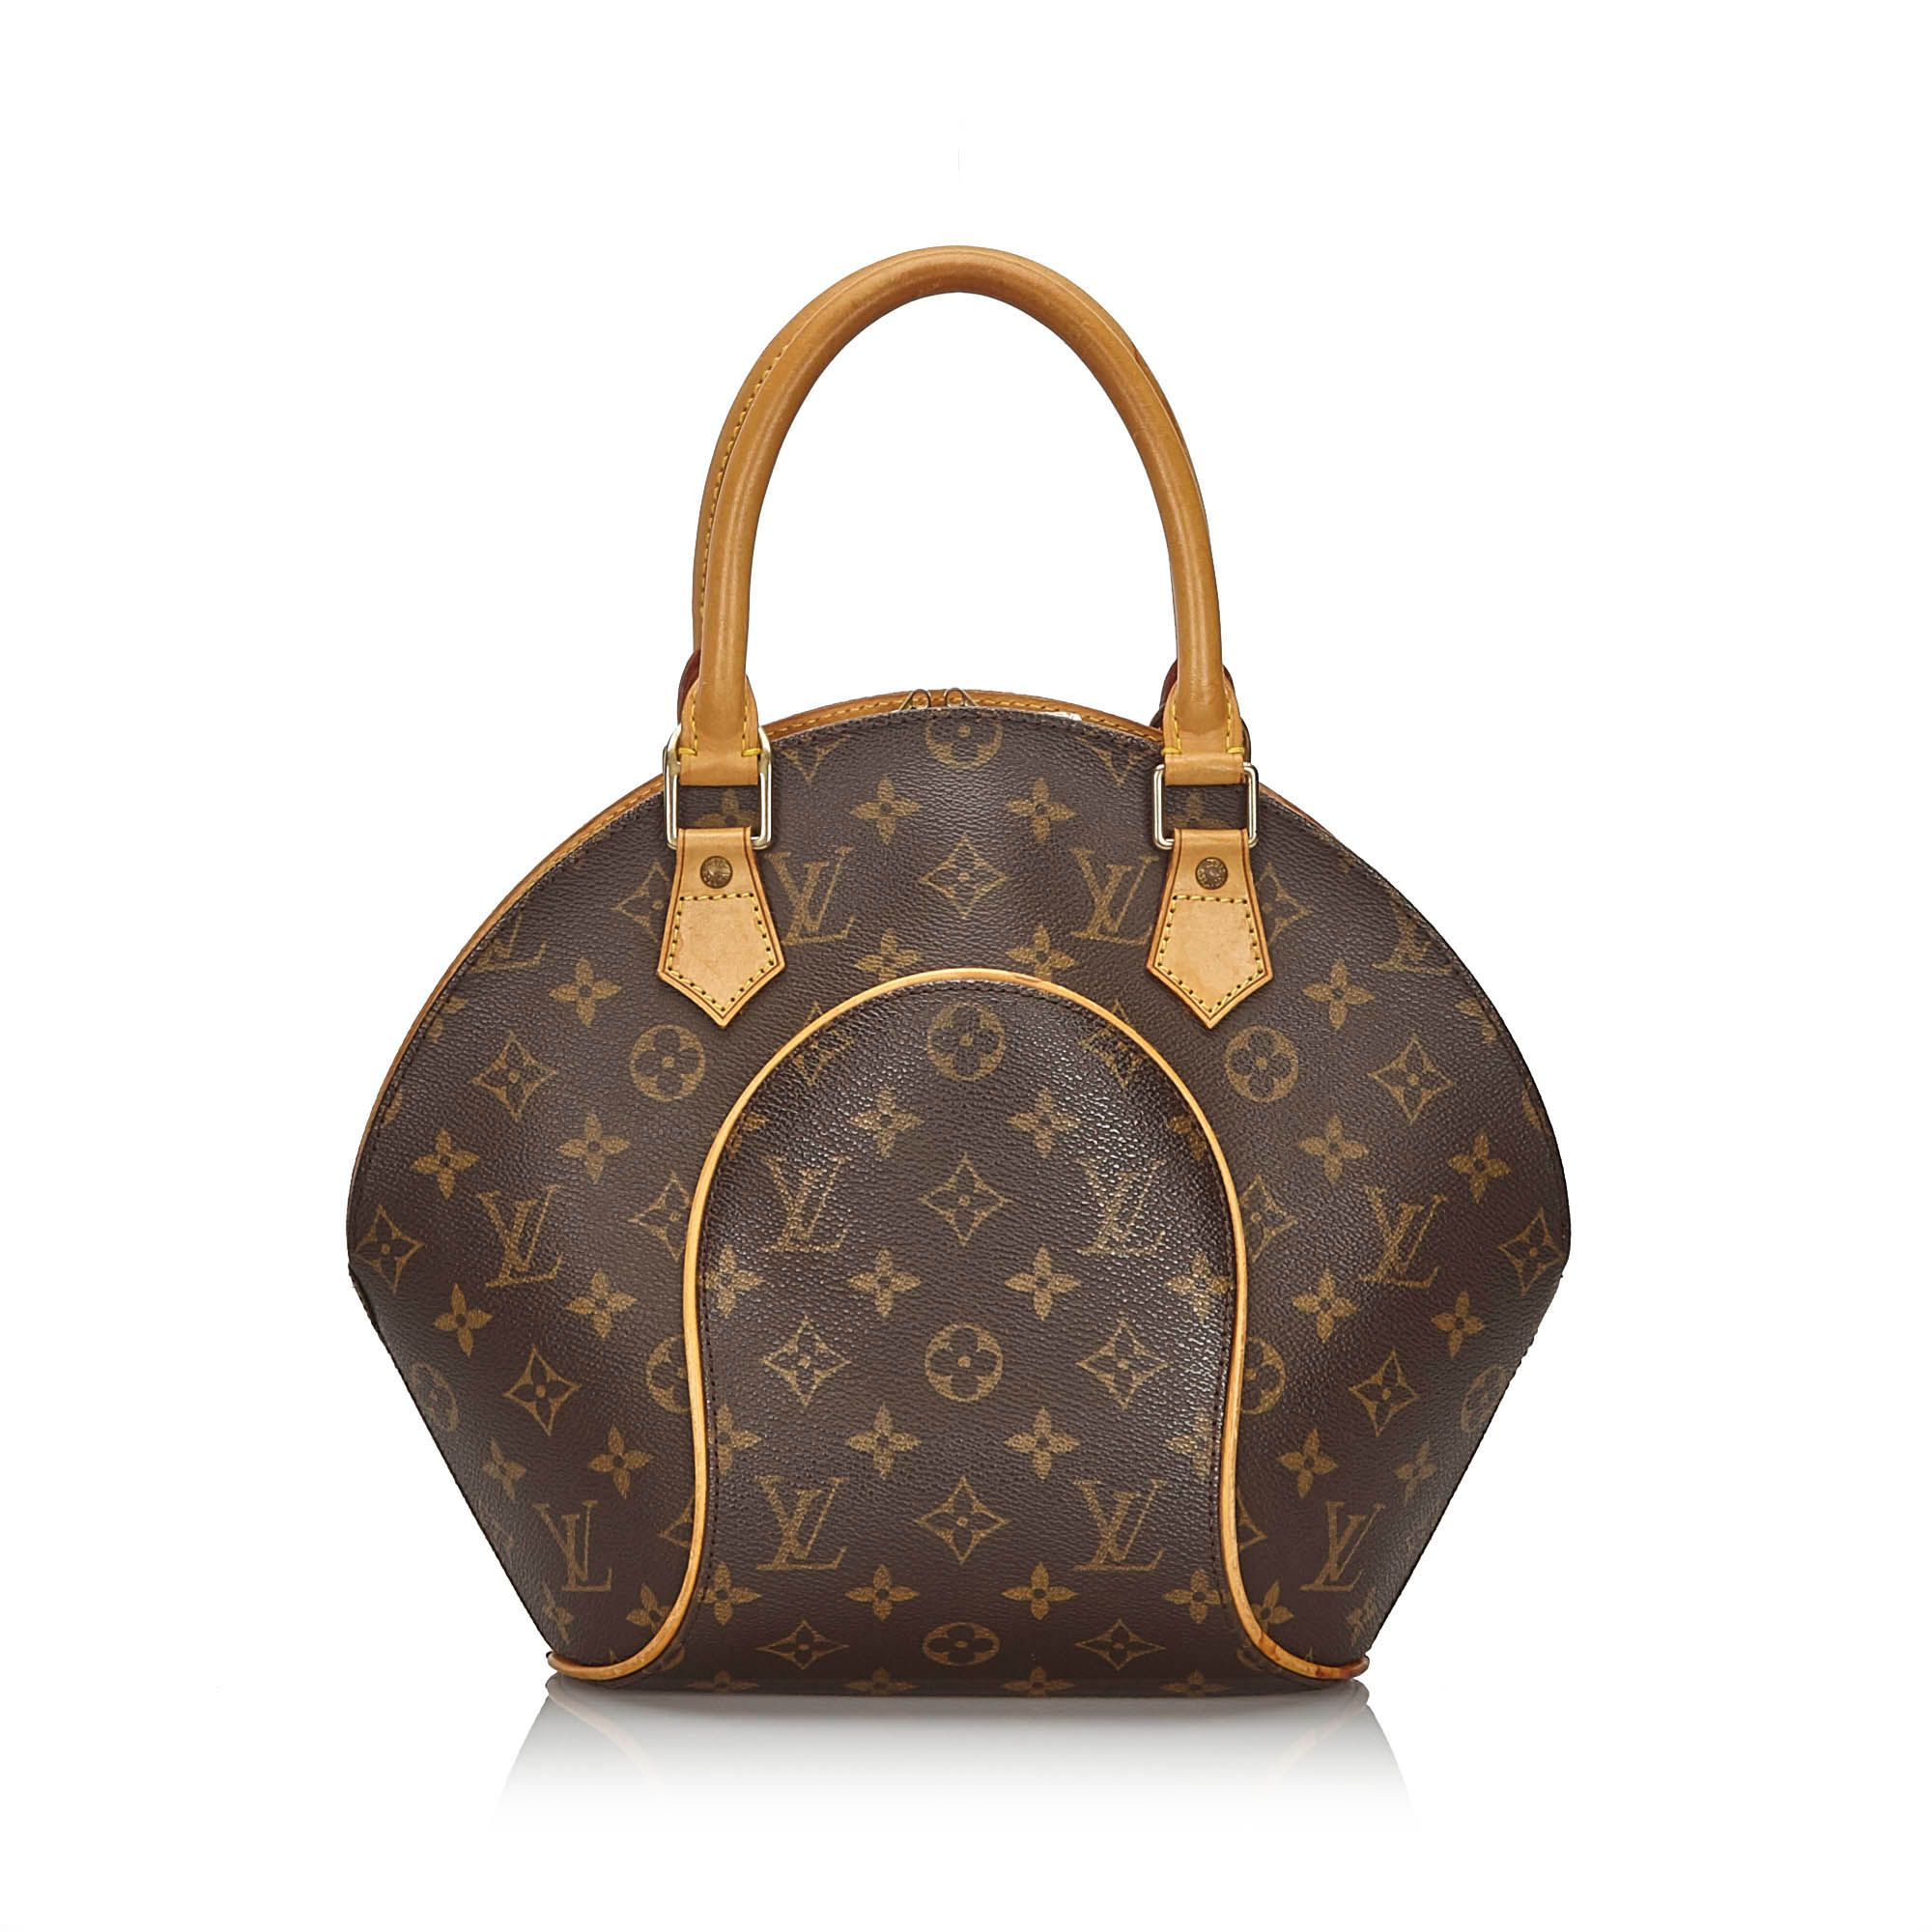 Vintage Louis Vuitton Monogram Ellipse PM Brown